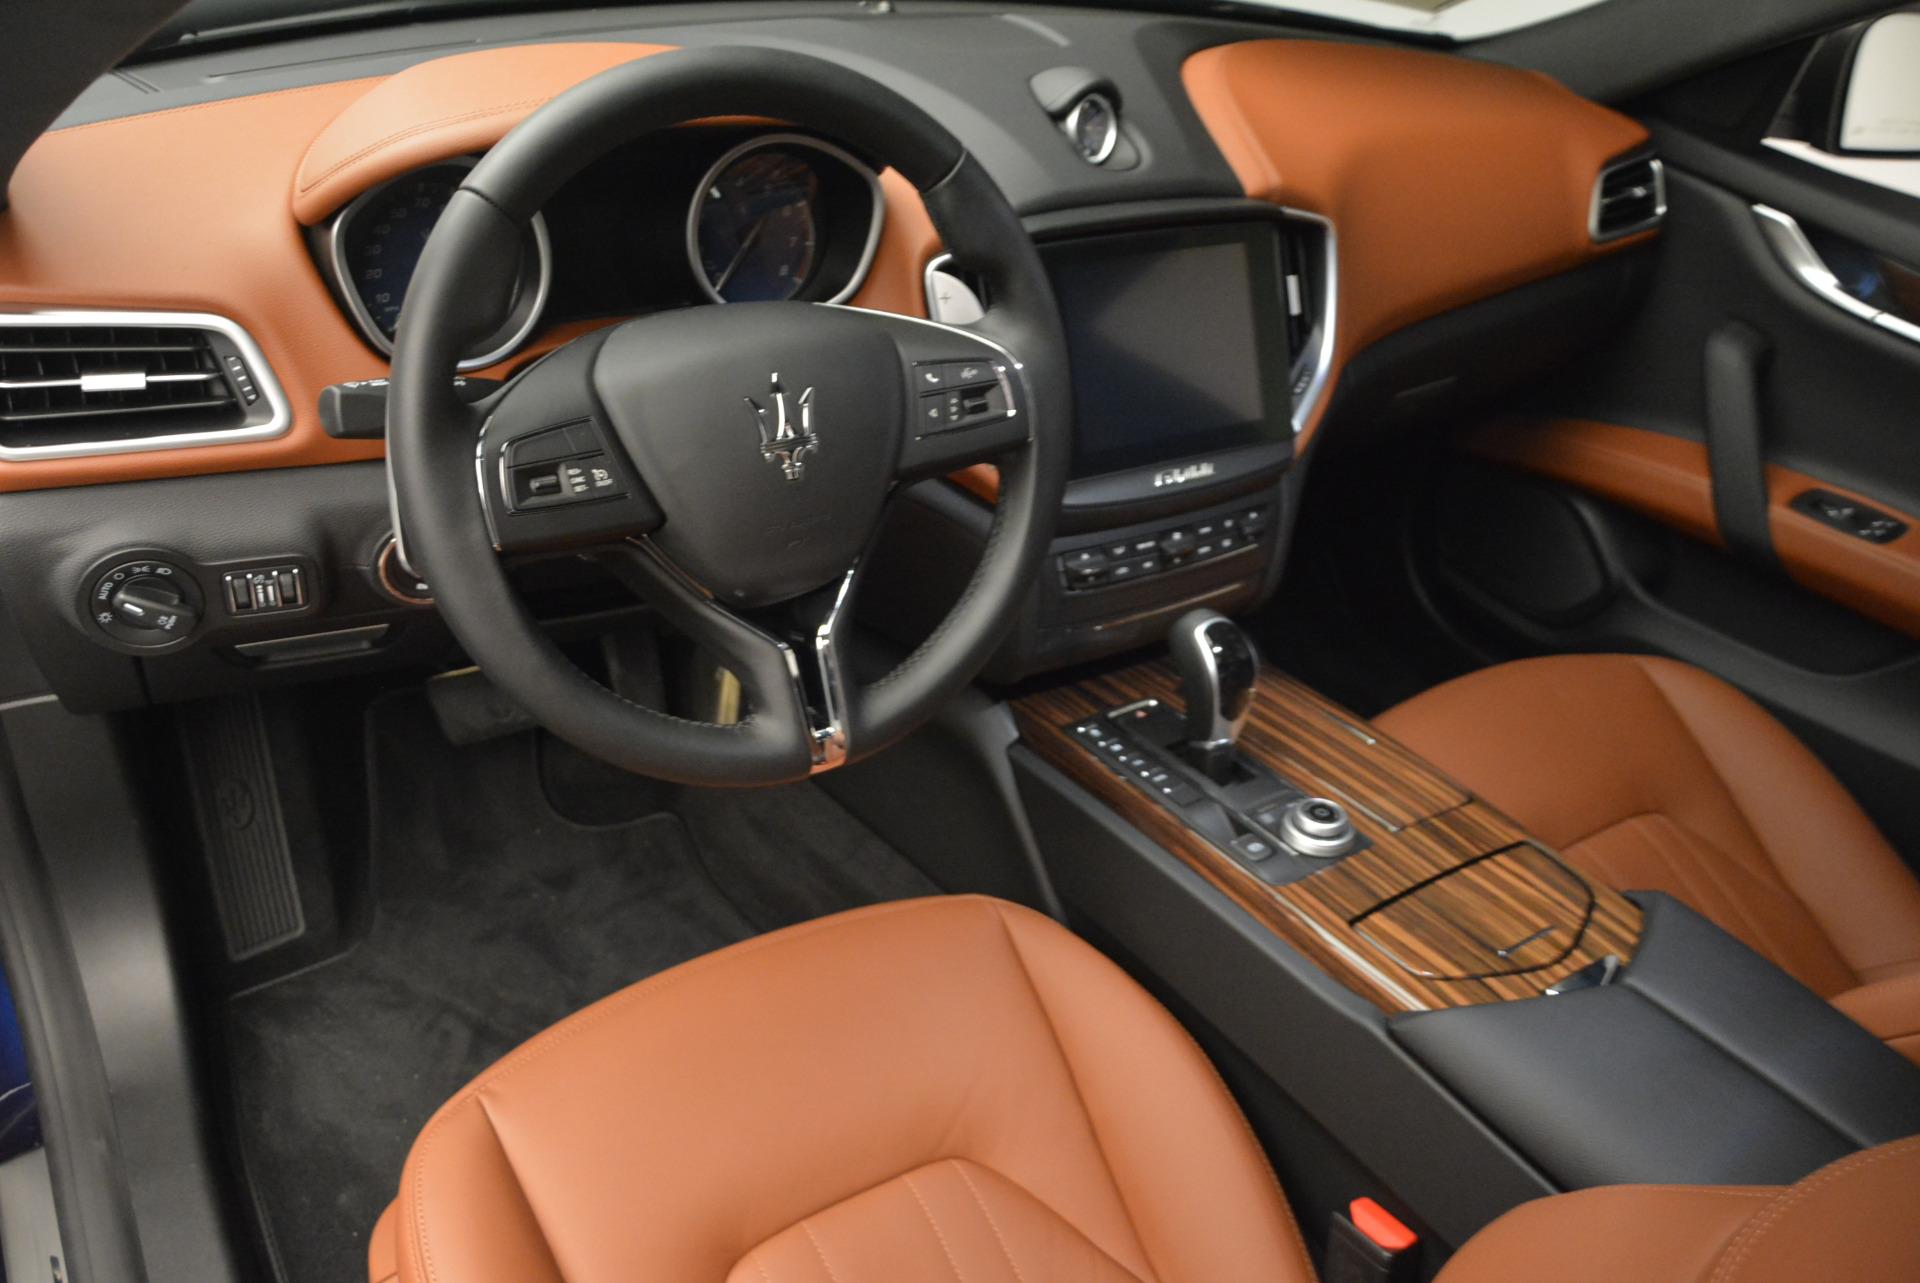 Used 2017 Maserati Ghibli S Q4 - EX Loaner For Sale In Greenwich, CT 568_p13